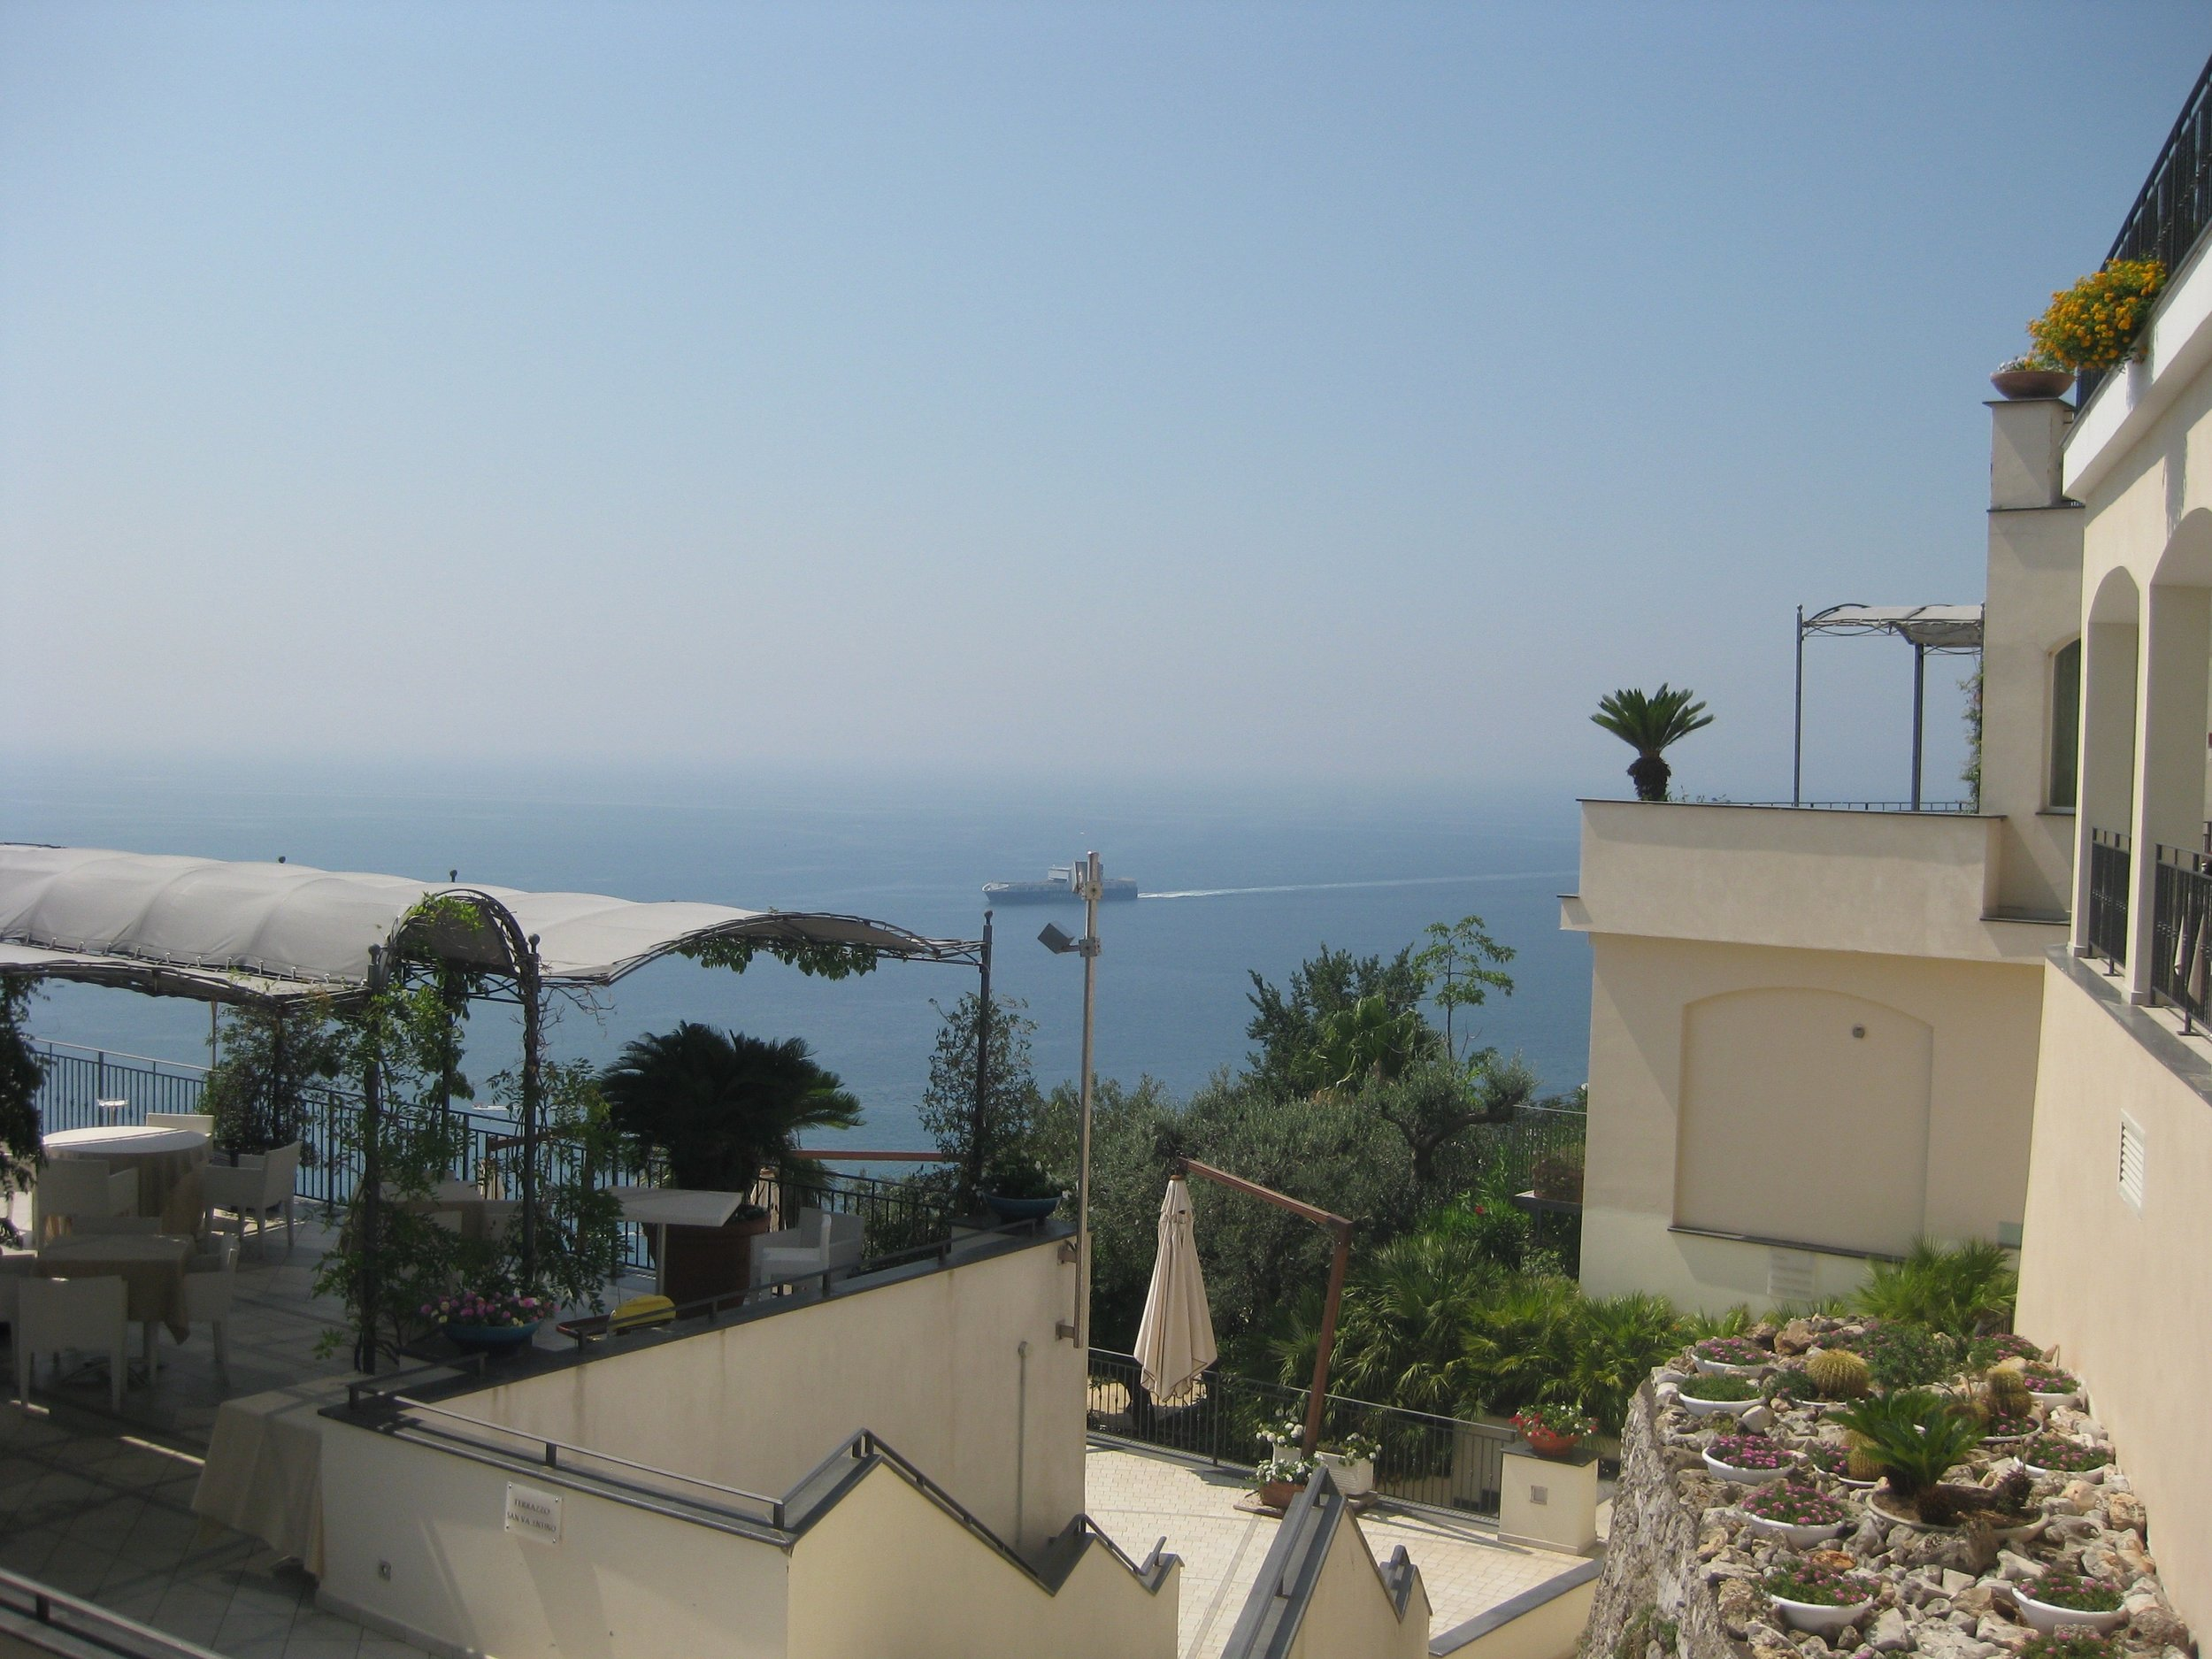 51 Amalfi Coast Hotel Italy 2015.jpg